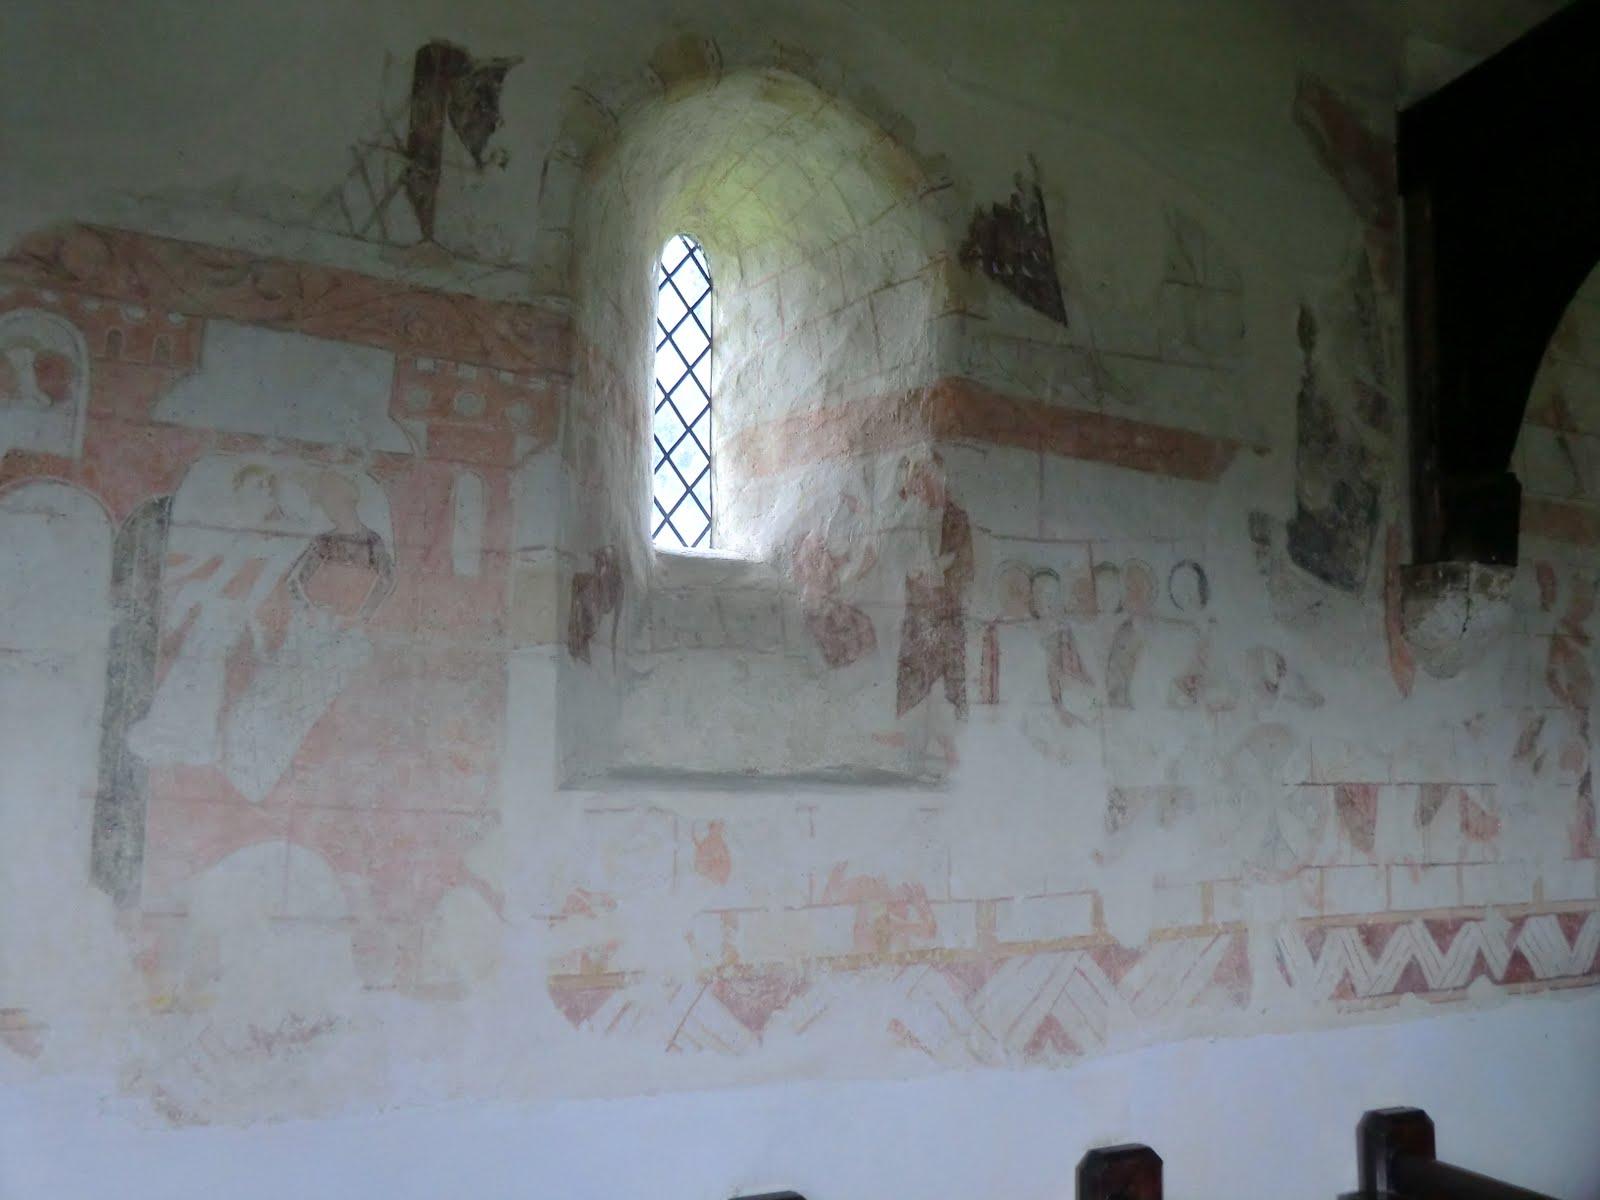 CIMG1603 Wall painting, Capel church